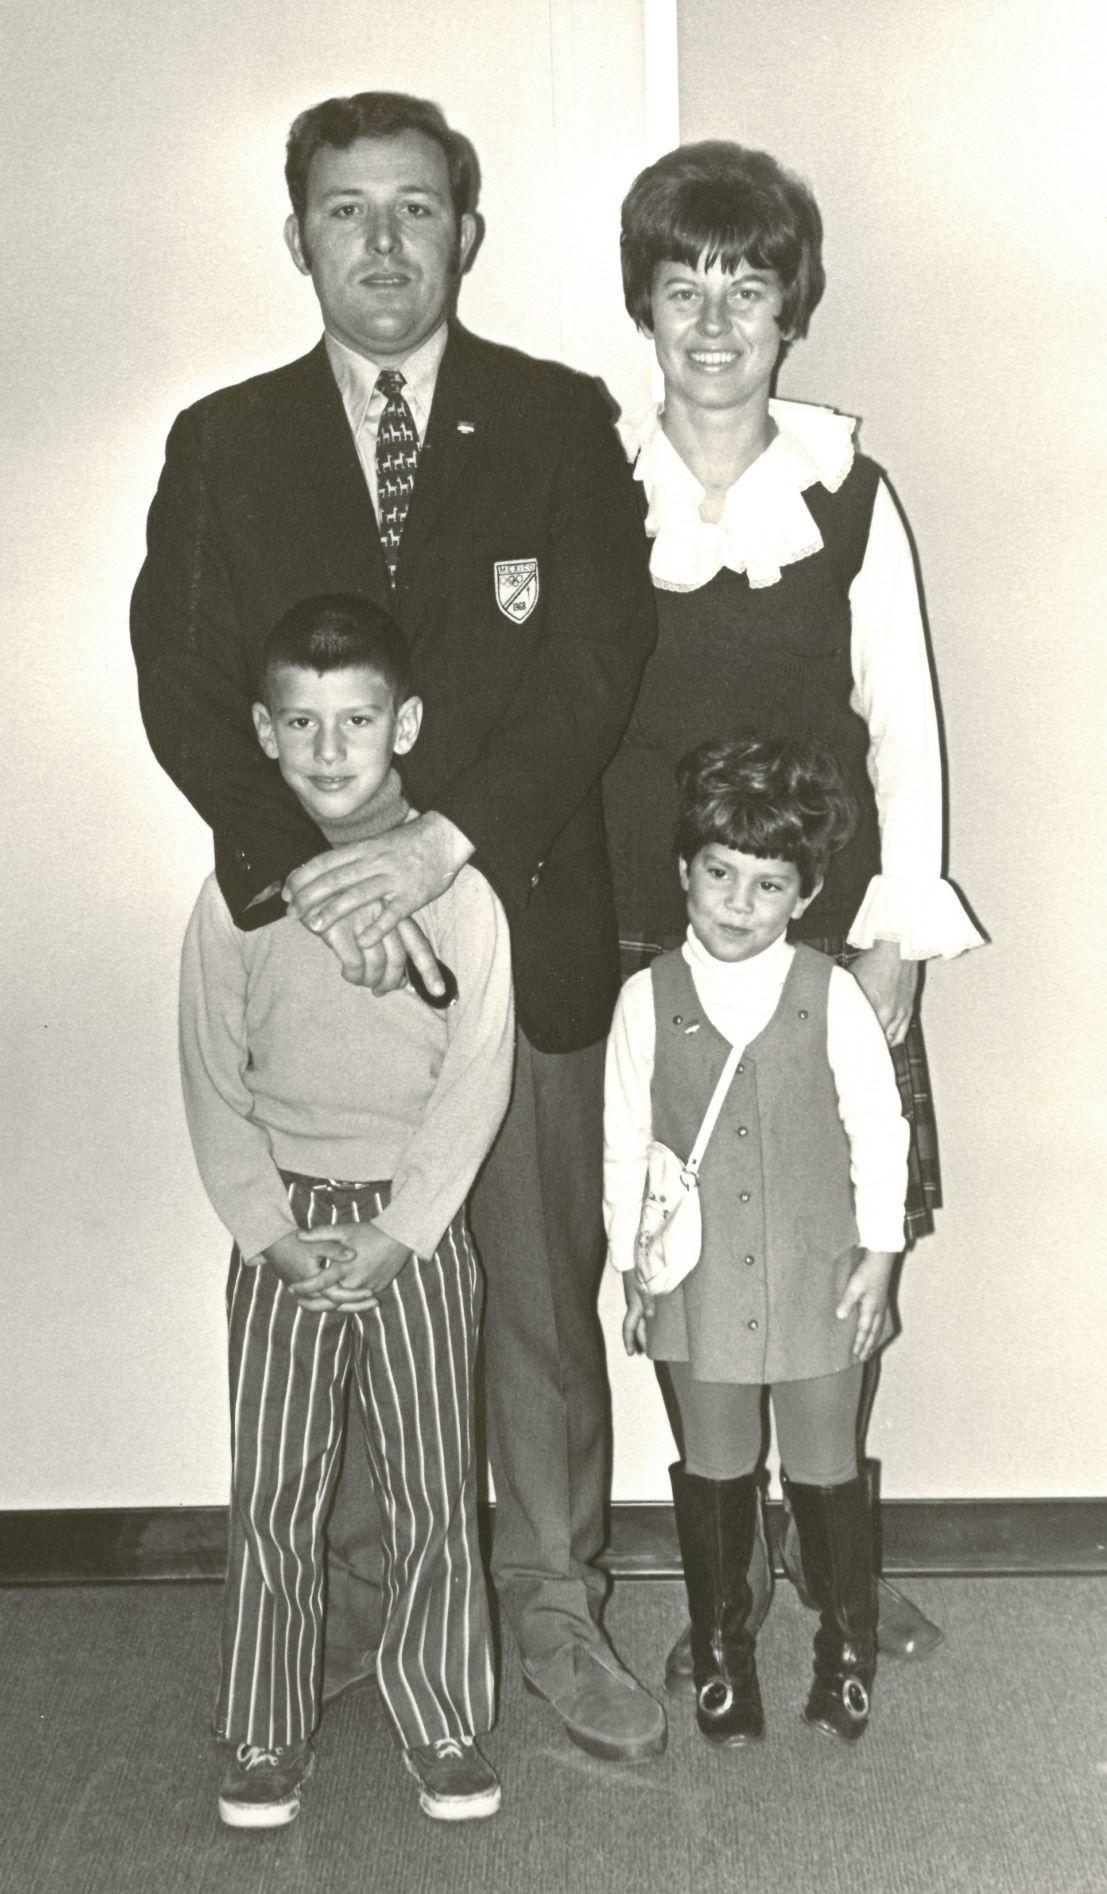 Bonanno, his wife Betty, and children